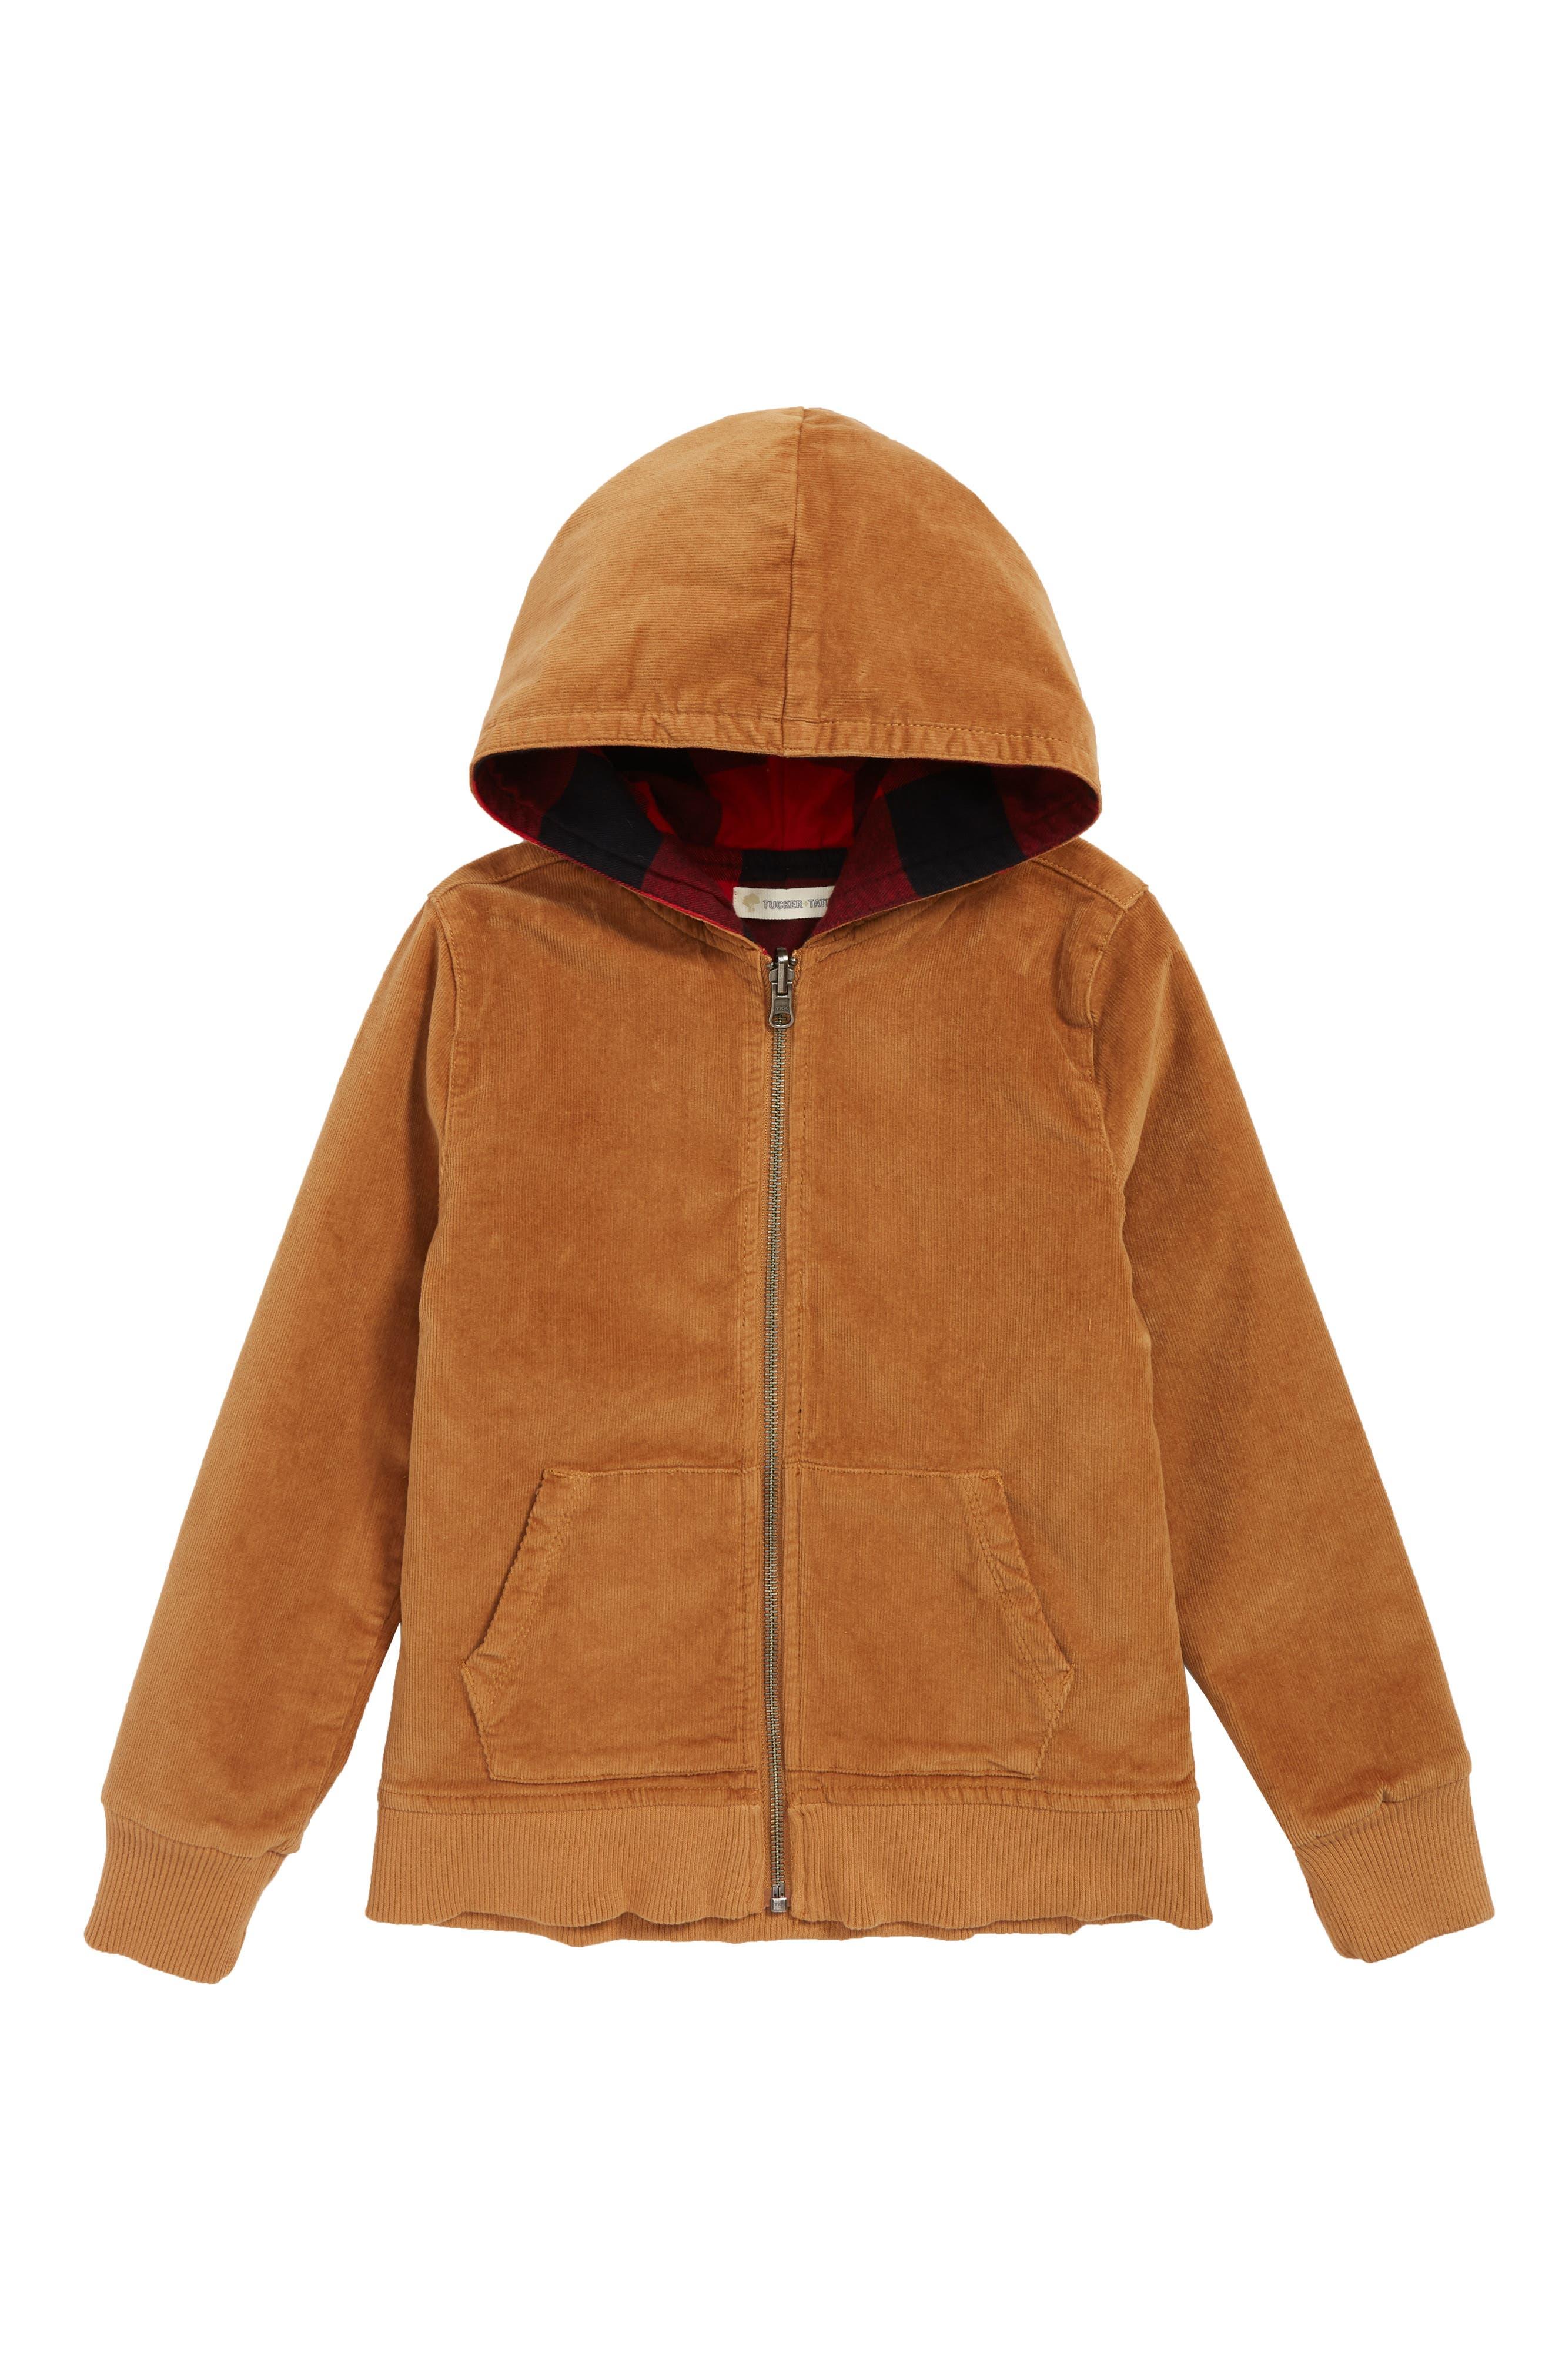 Reversible Corduroy/Plaid Hooded Jacket,                             Main thumbnail 1, color,                             TAN DALE